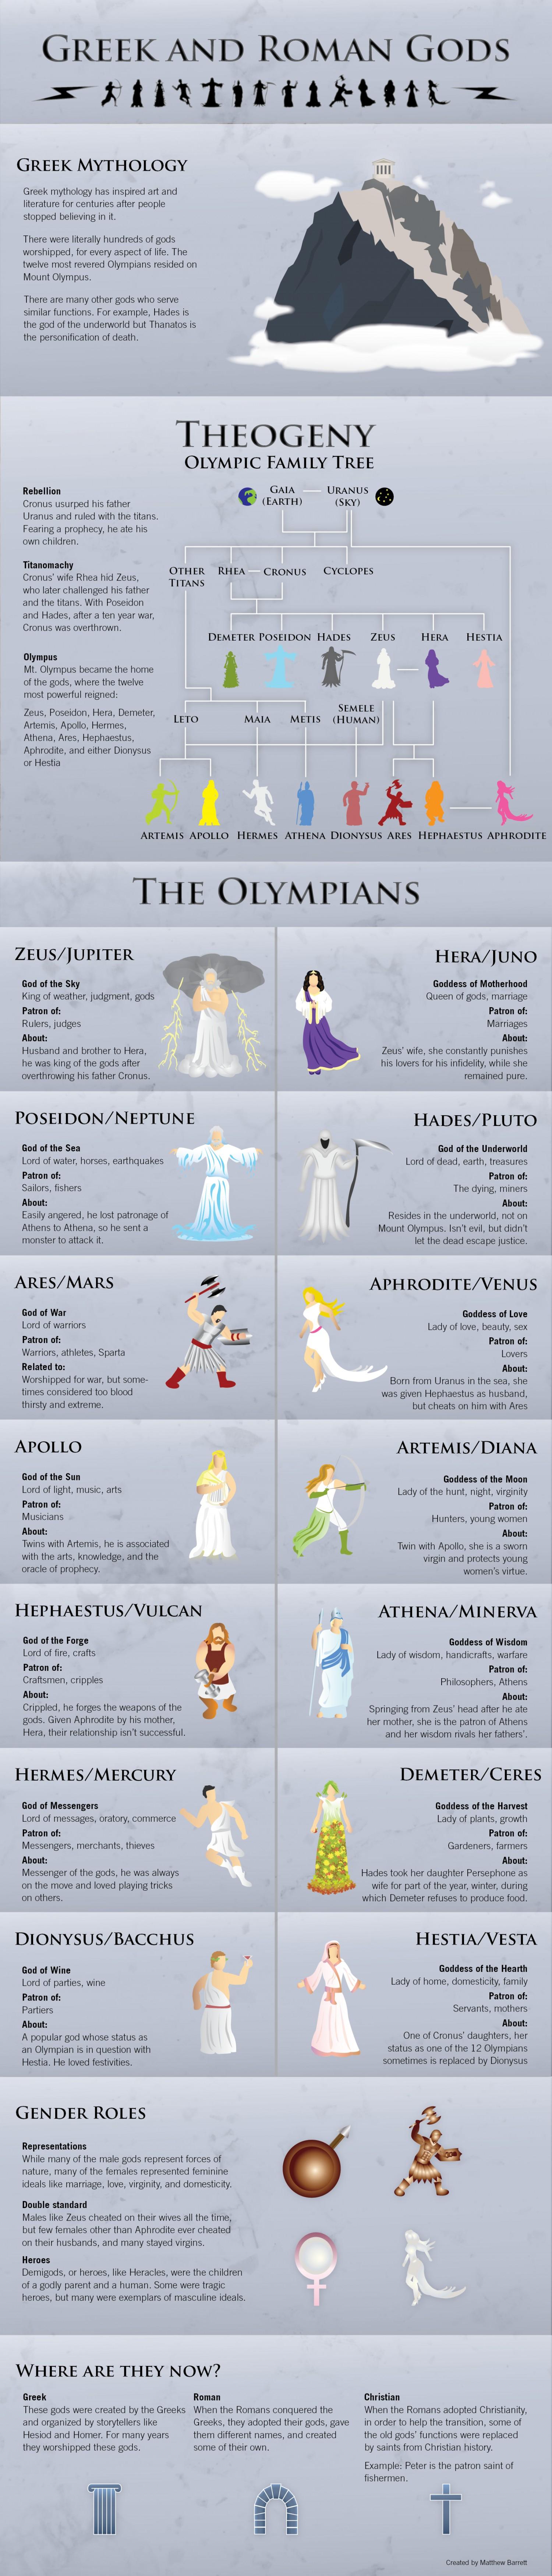 Greek and Roman God Mythology